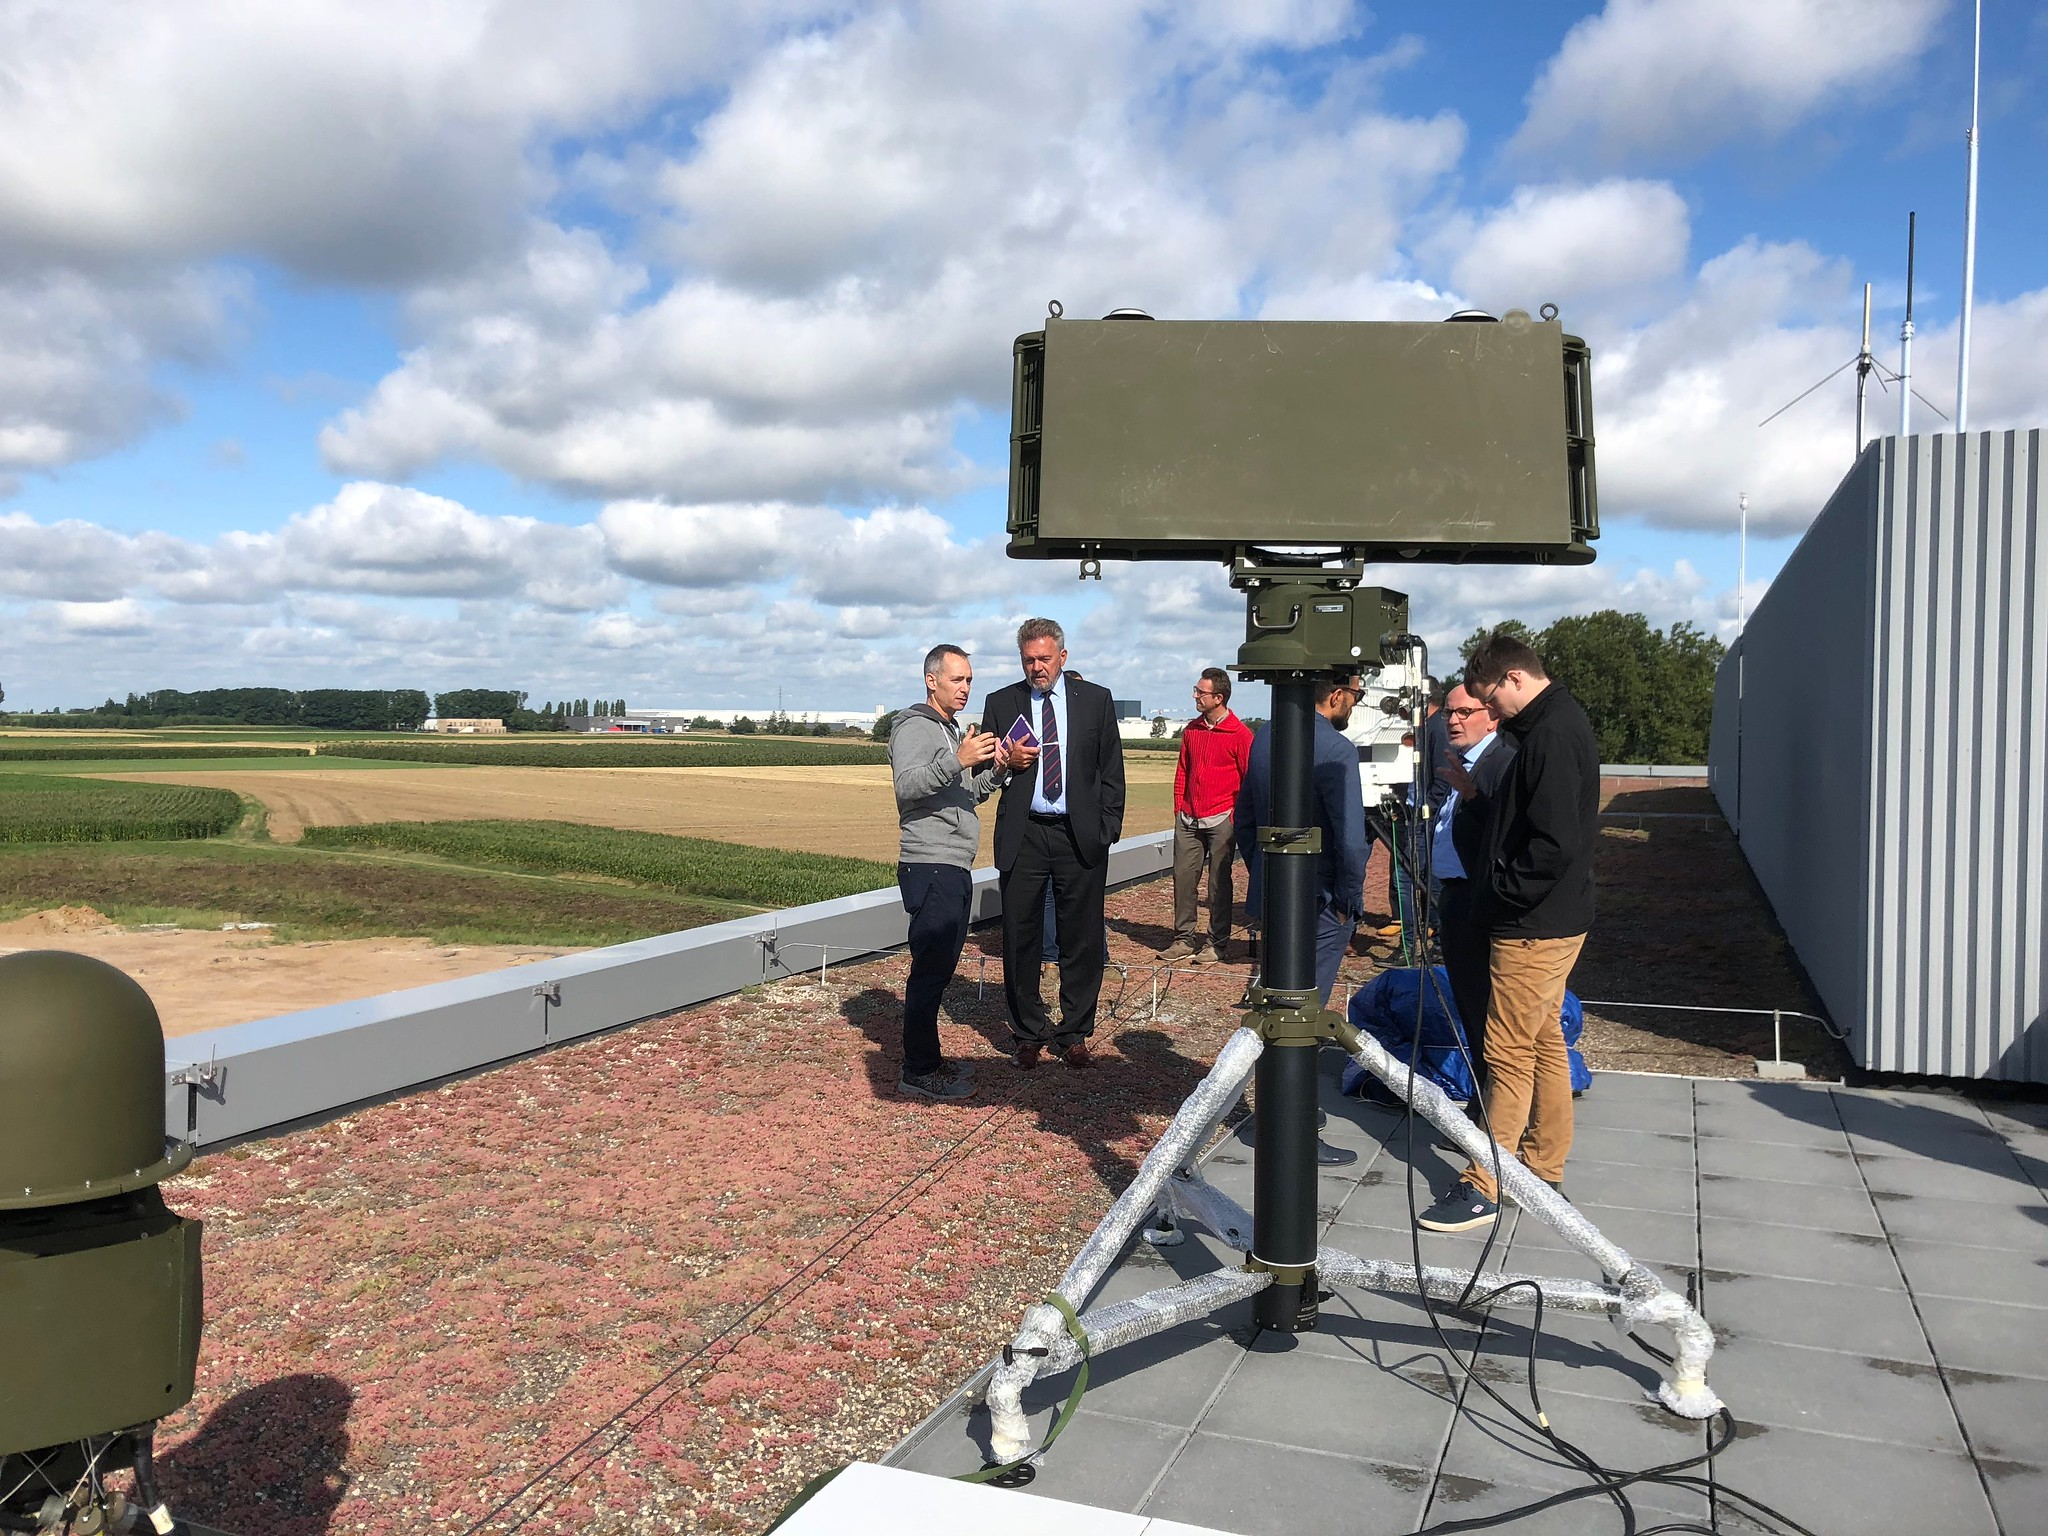 20190814 - BATS demonstreert counter-drone radarsysteem